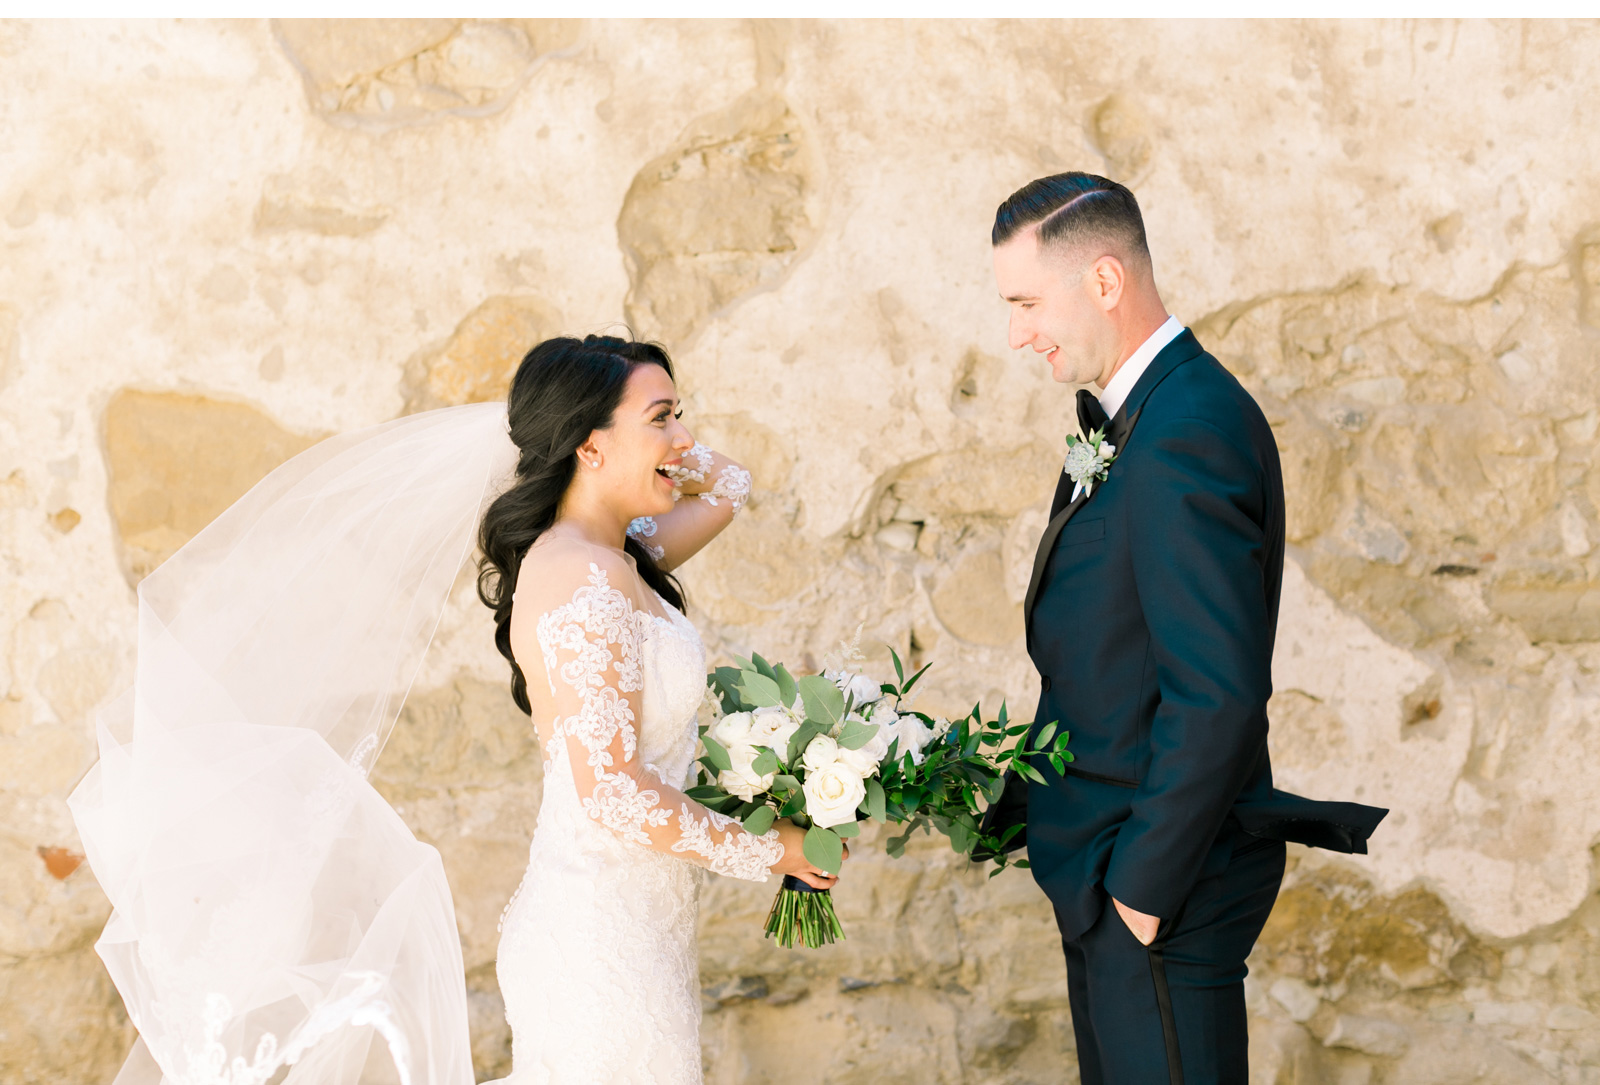 Southern-California-Weddings-Natalie-Schutt-Photography-Weddings_03.jpg